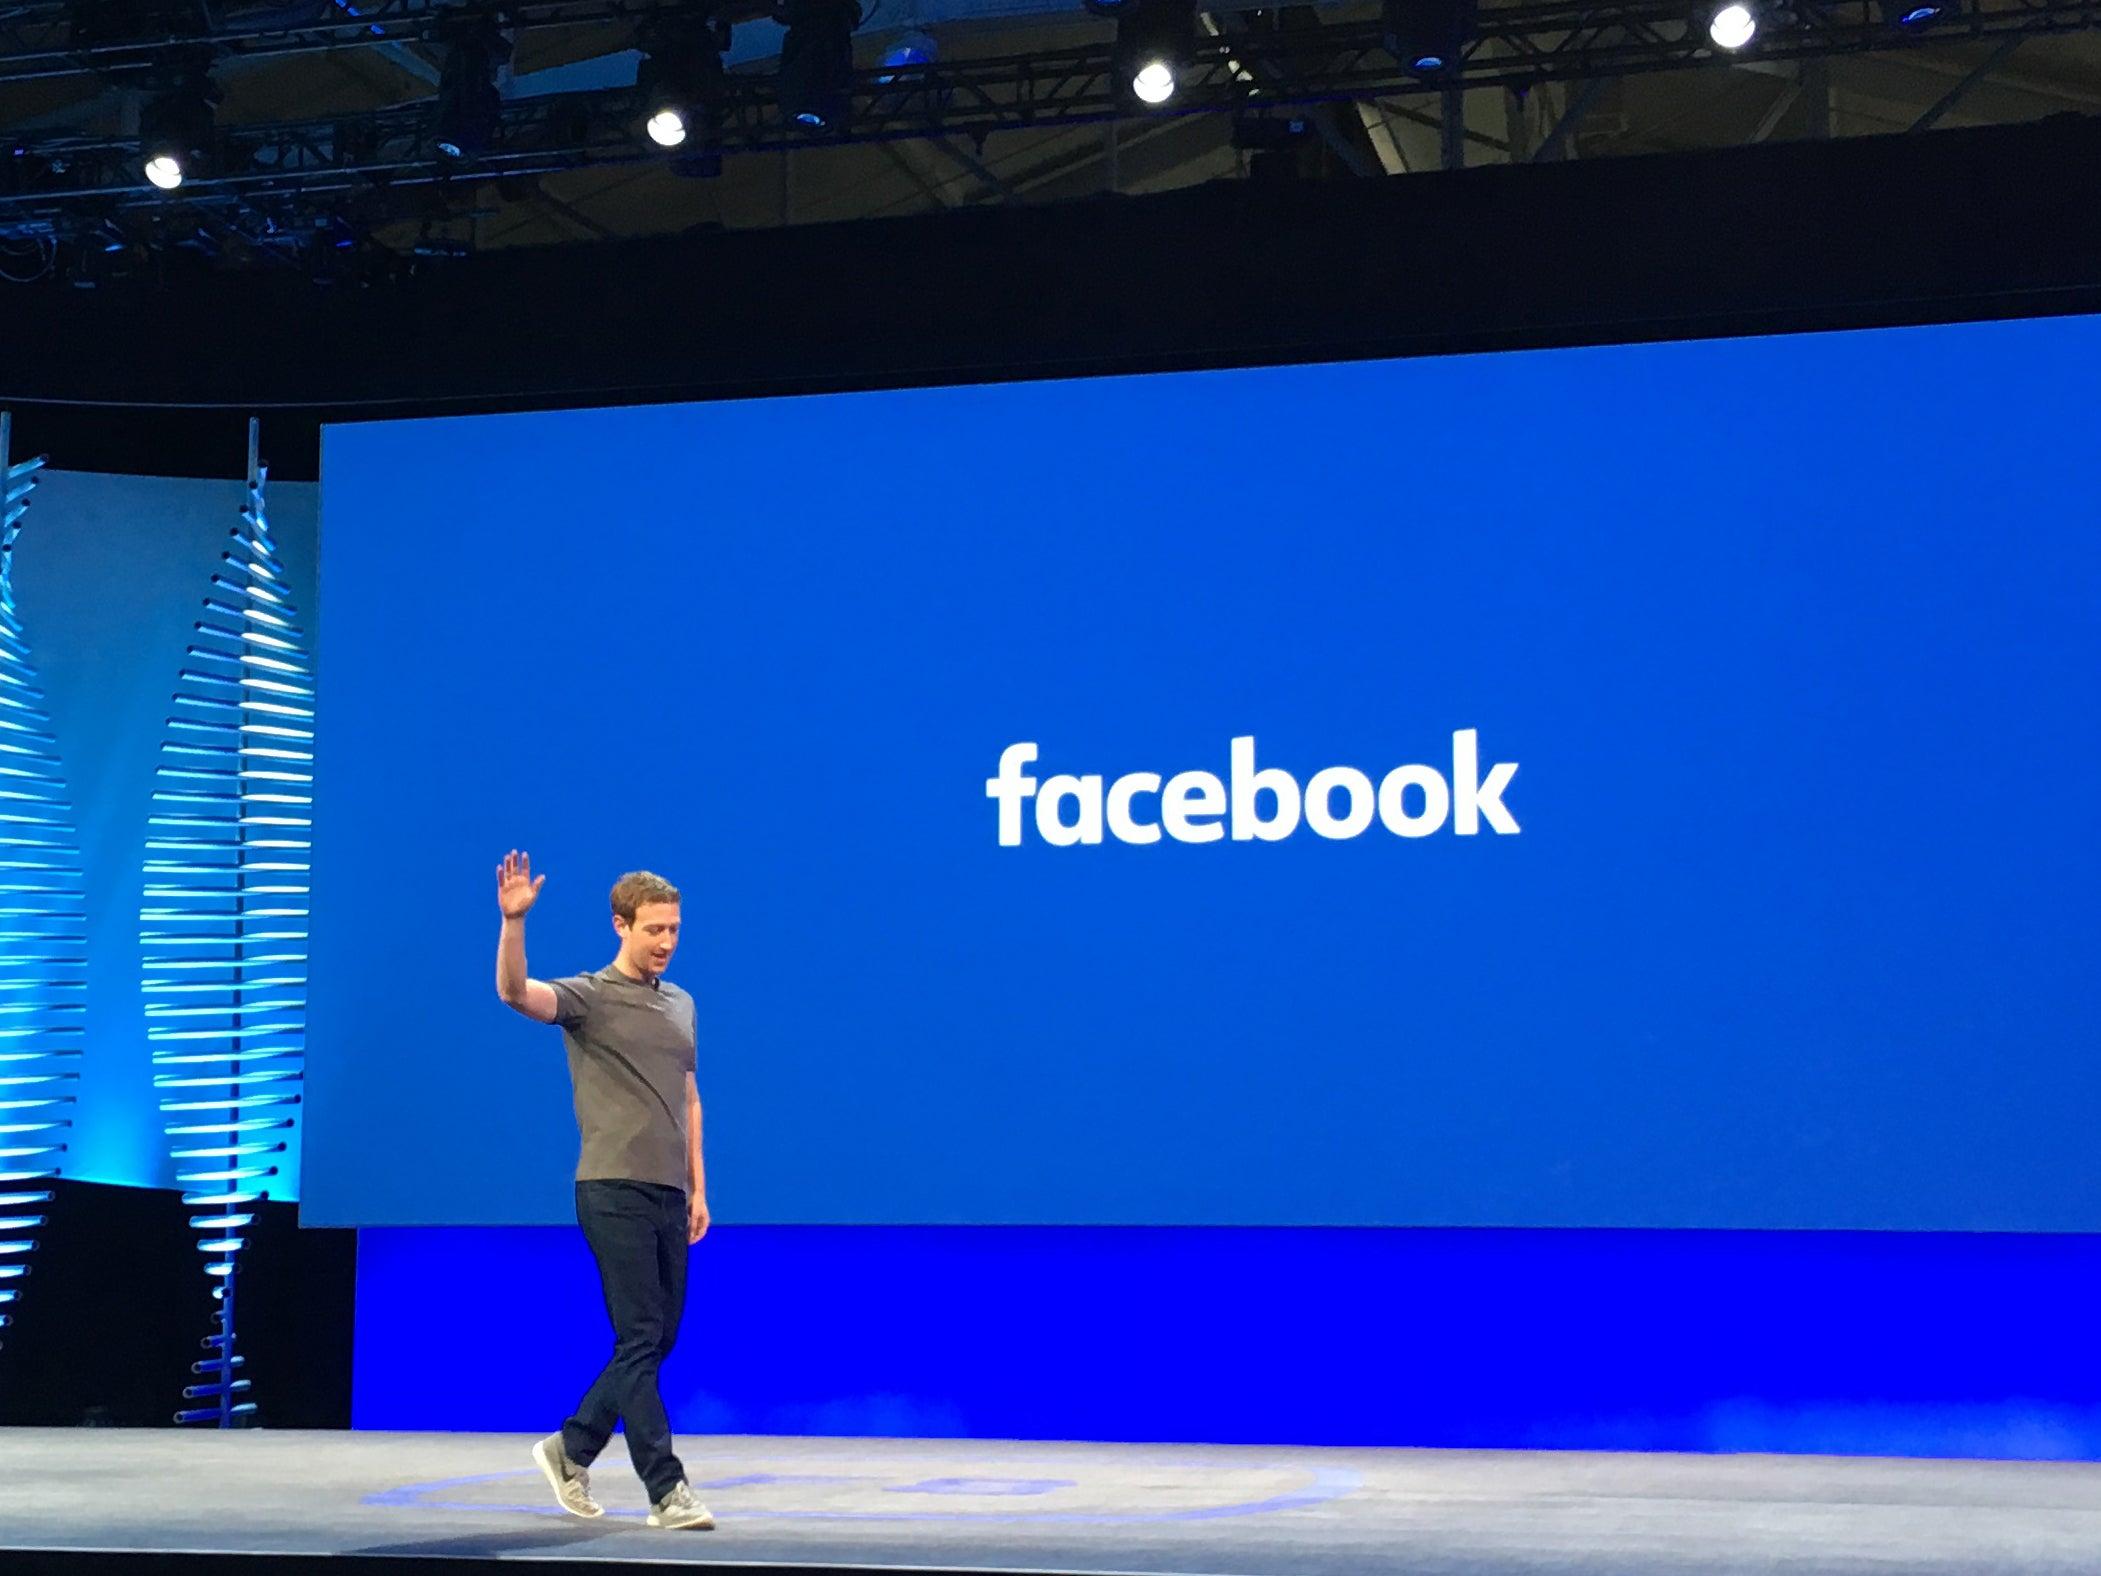 Mark Zuckerberg walks on stage to open Facebook's F8 developer conference.